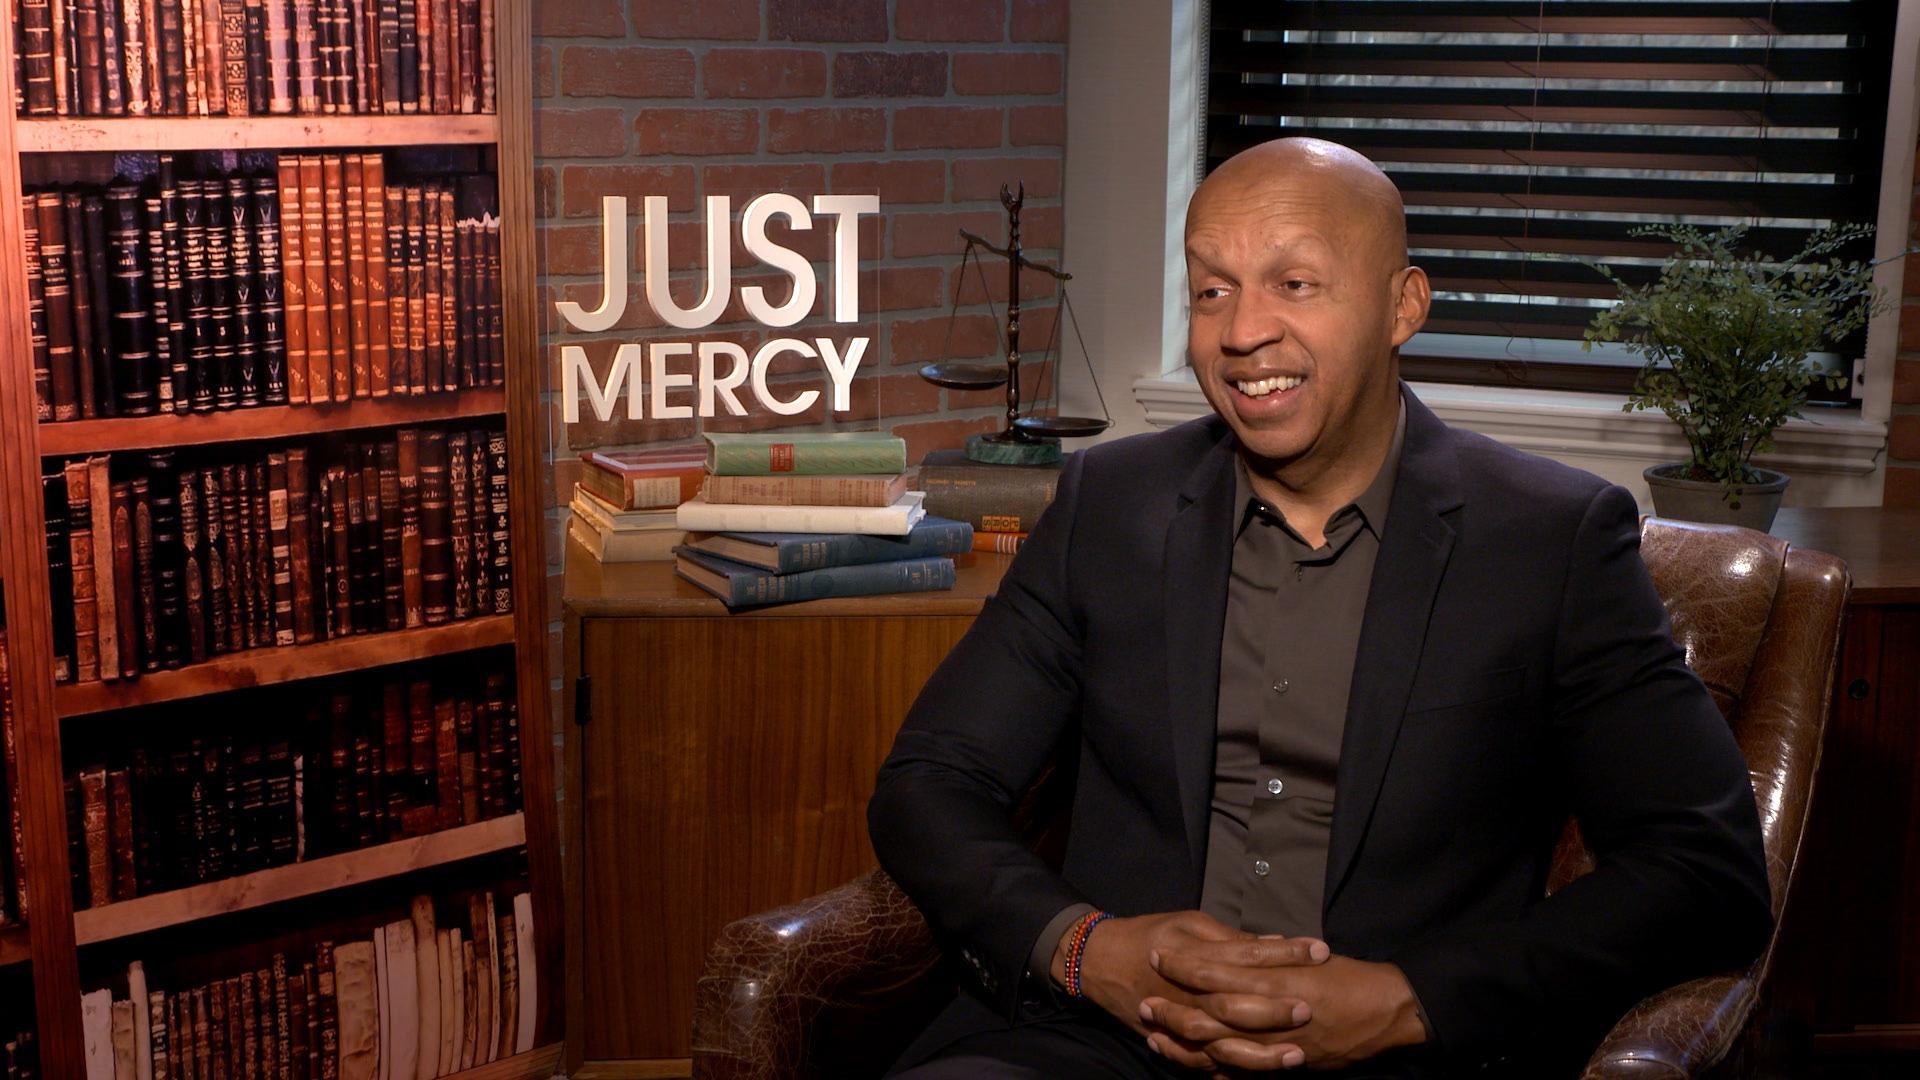 Real Life Superhero Bryan Stevenson Talks Just Mercy and His 1920x1080